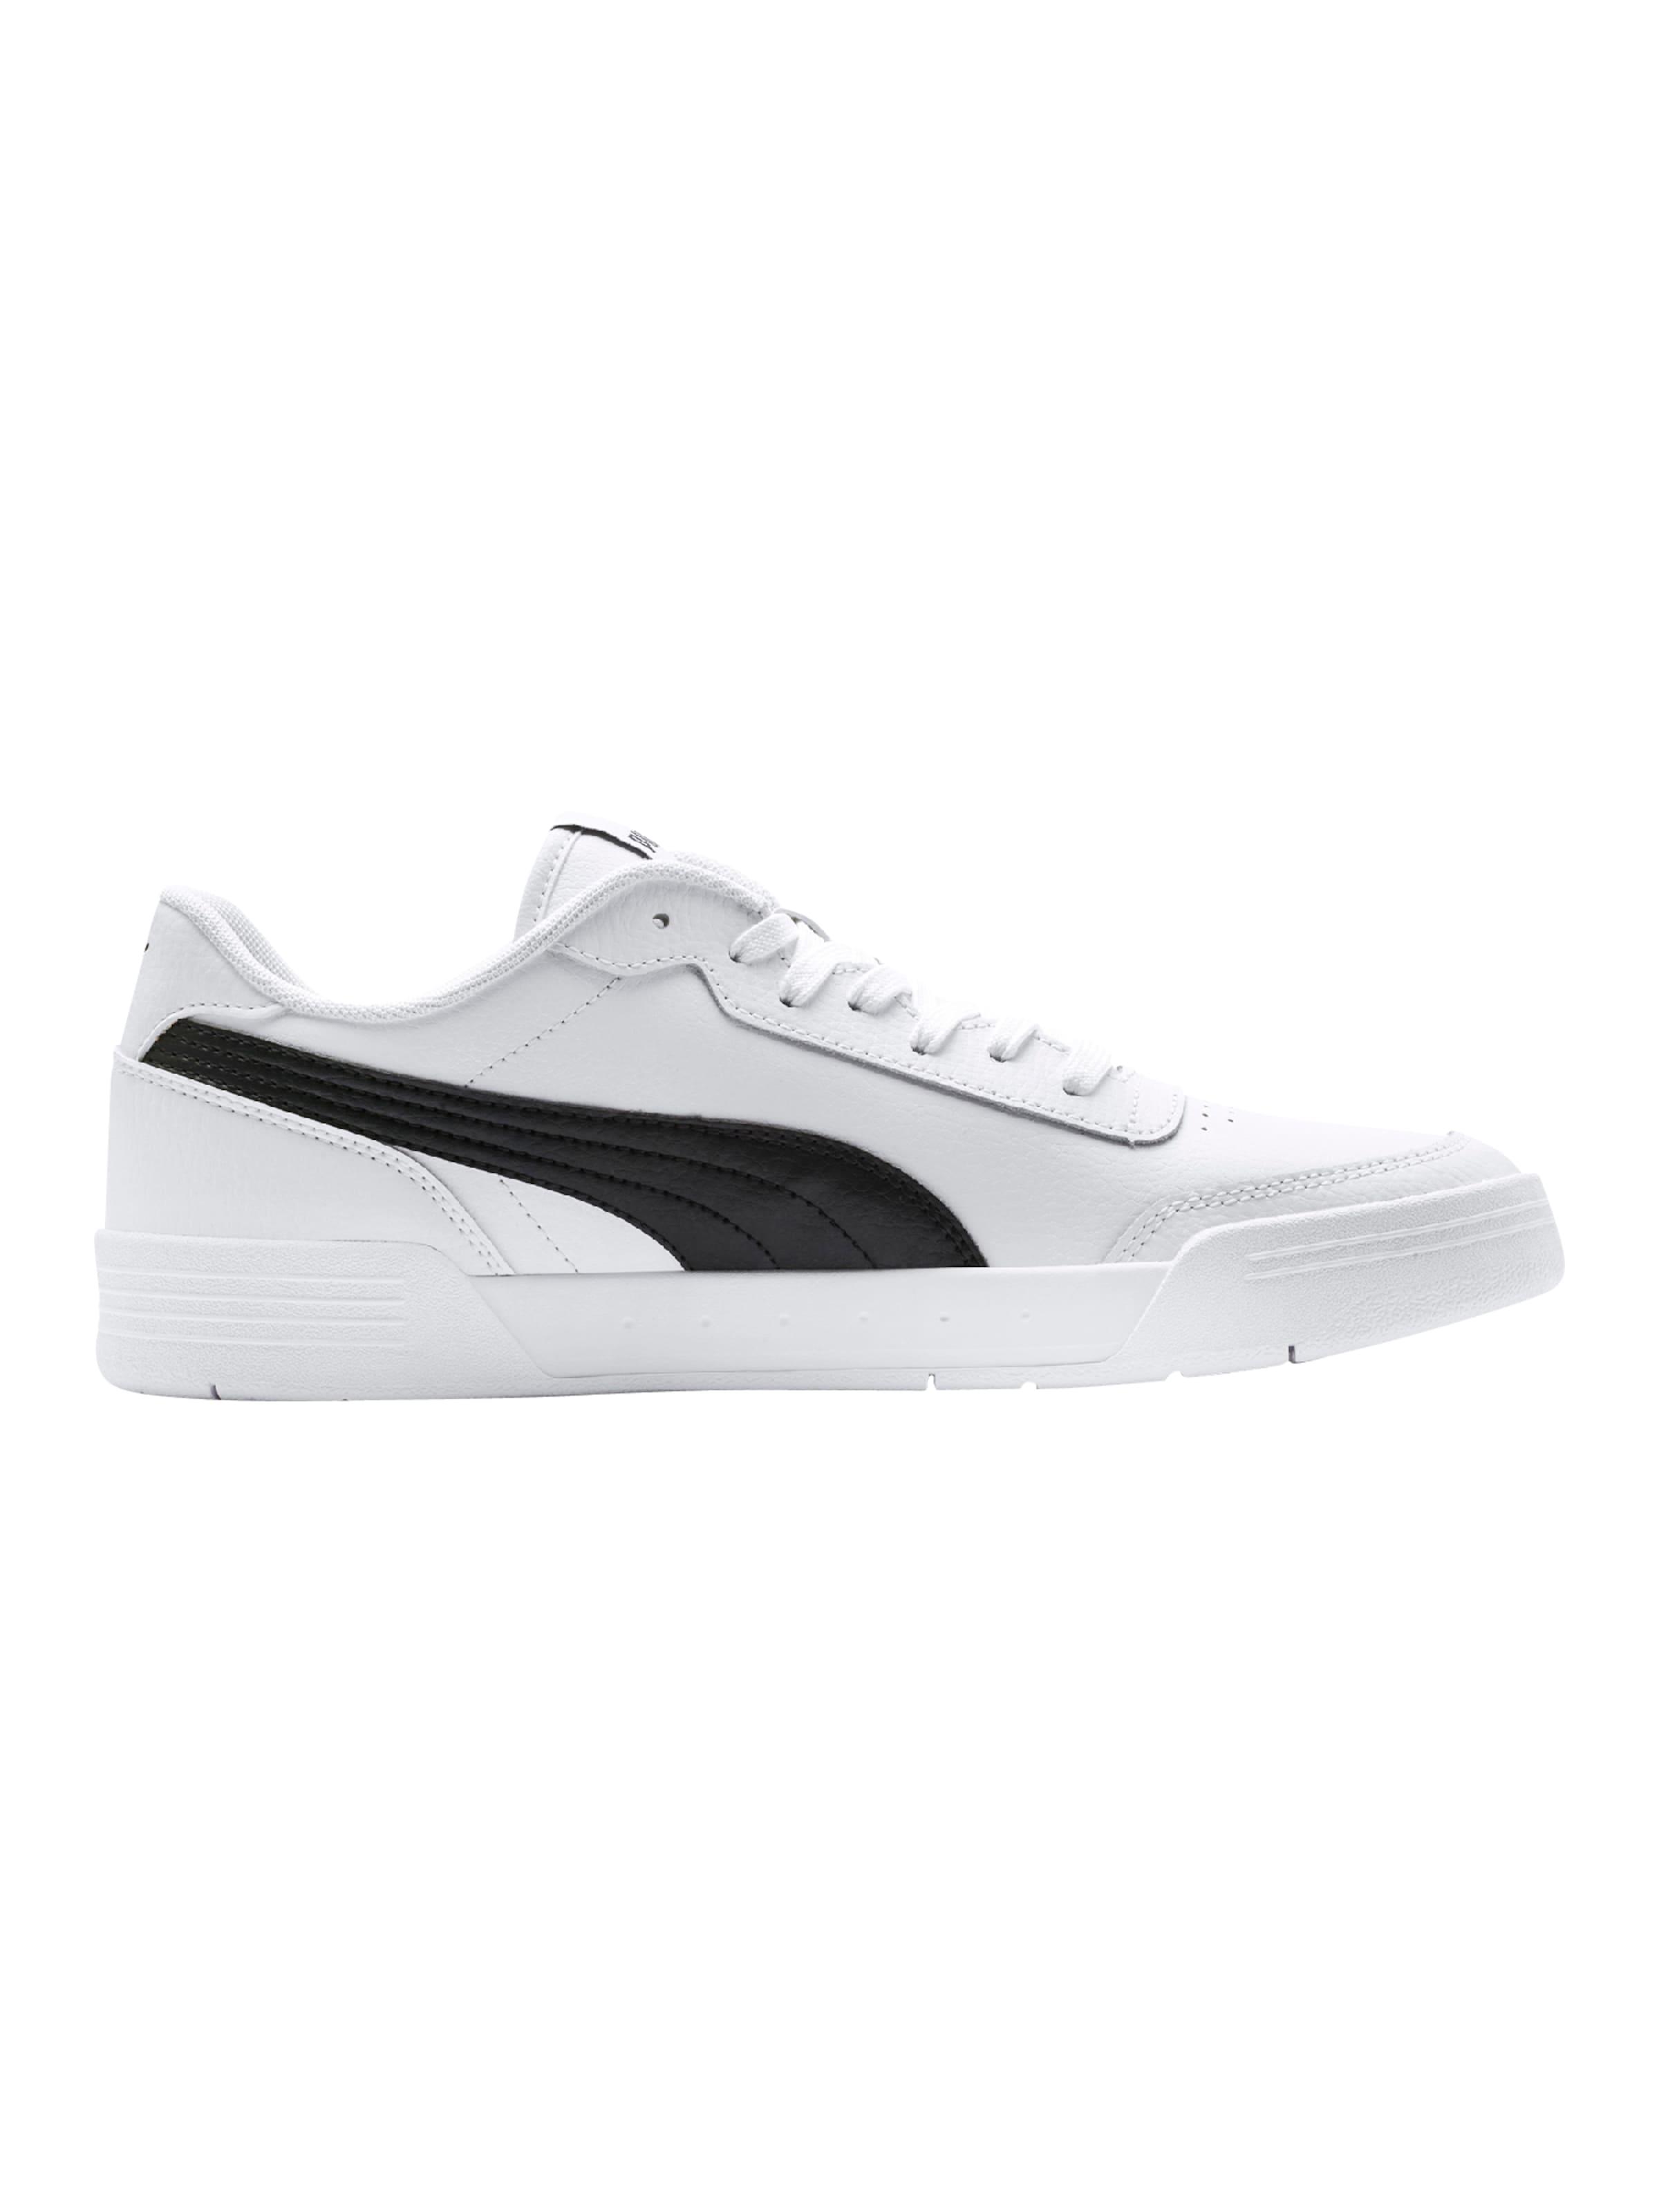 Puma SchwarzWeiß 'caracal' Sneaker In Puma OkXiTPuZ